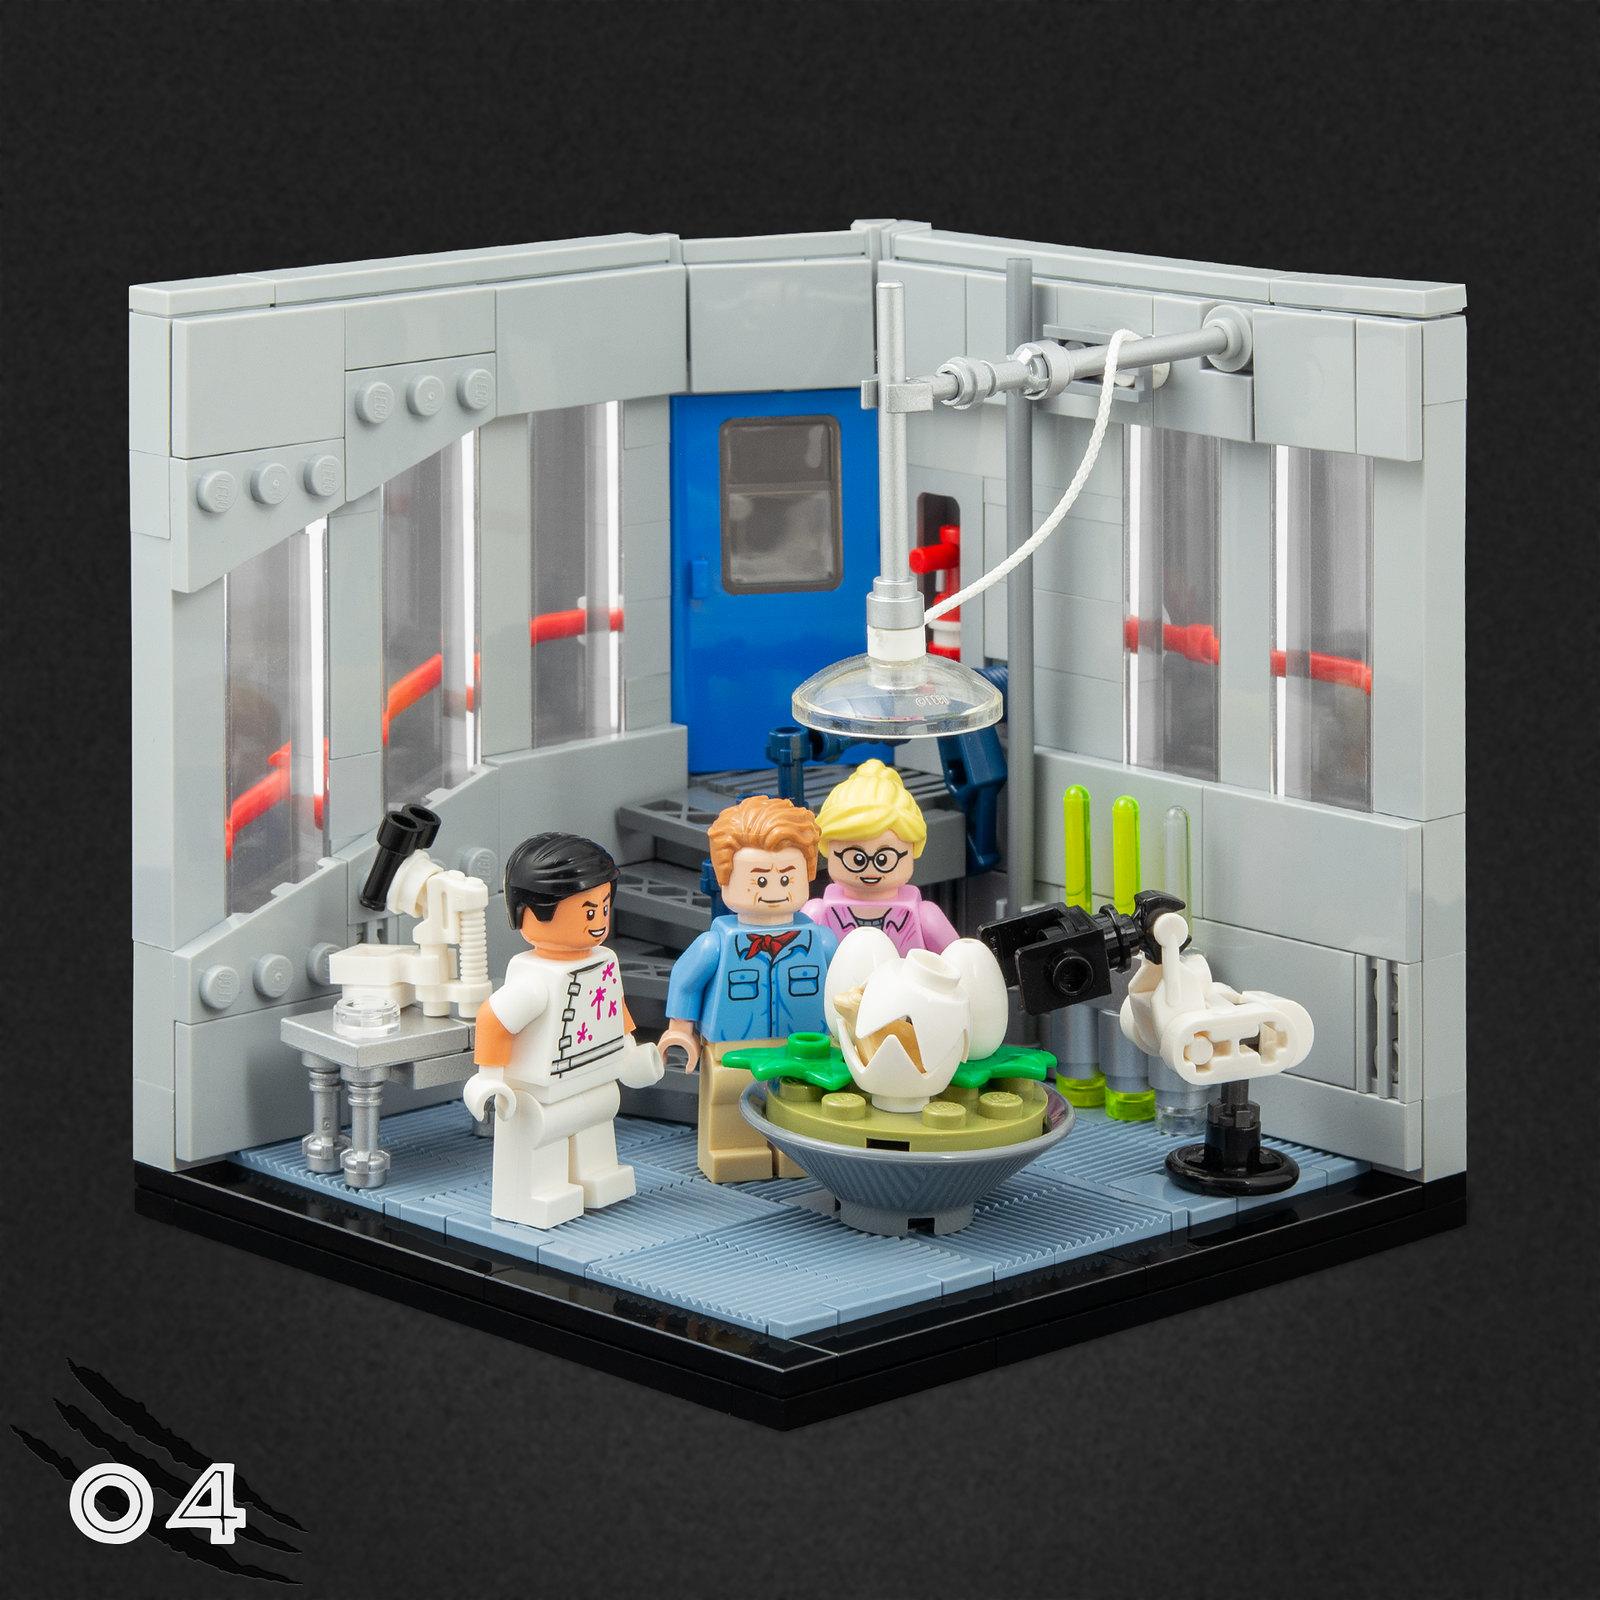 04 - Isla Nublar Laboratory